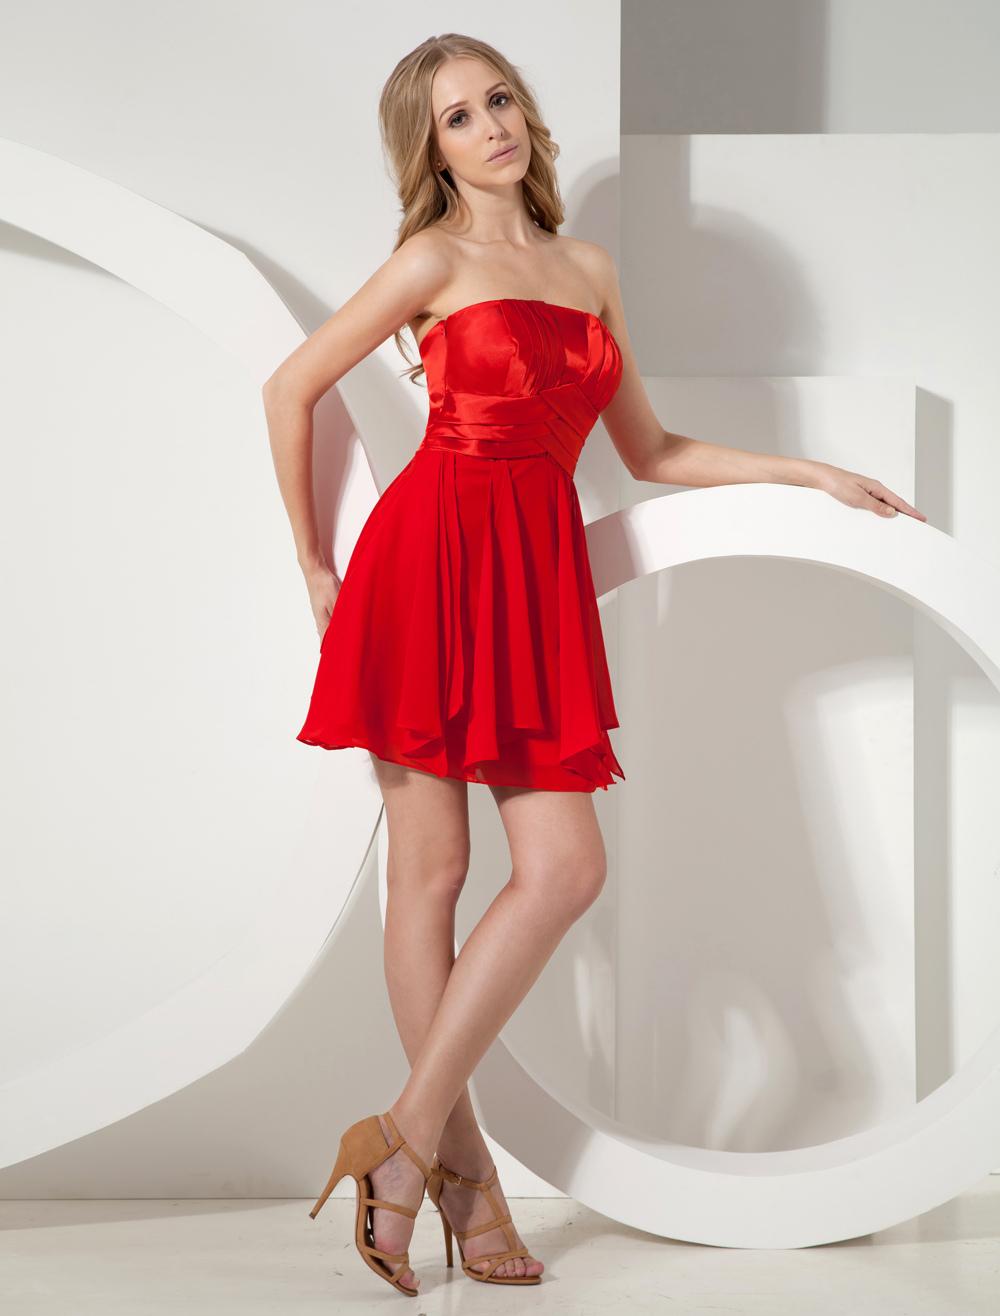 Red Strapless Ruffled Chiffon Woman's Homecoming Dress (Wedding Cheap Party Dress) photo